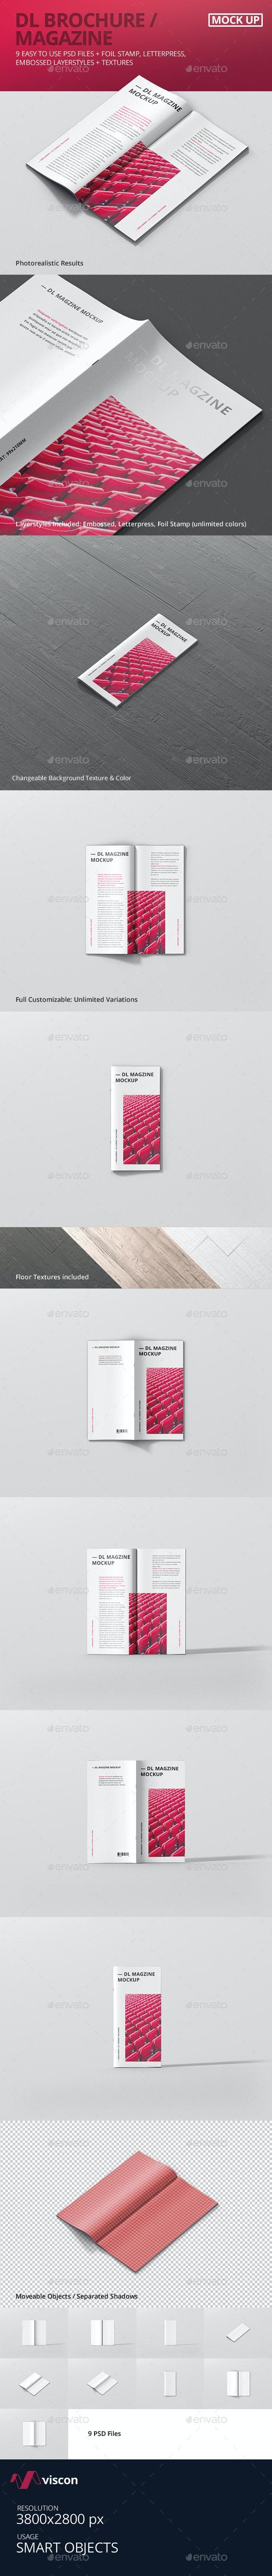 DL Brochure / Magazine Mockup - Magazines Print